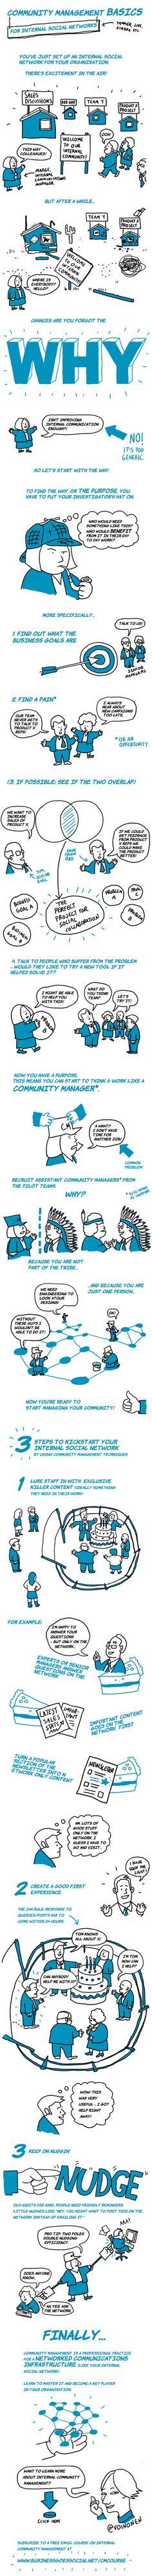 Community Management Basics for Internal Social Networks #infographic #Community #Management